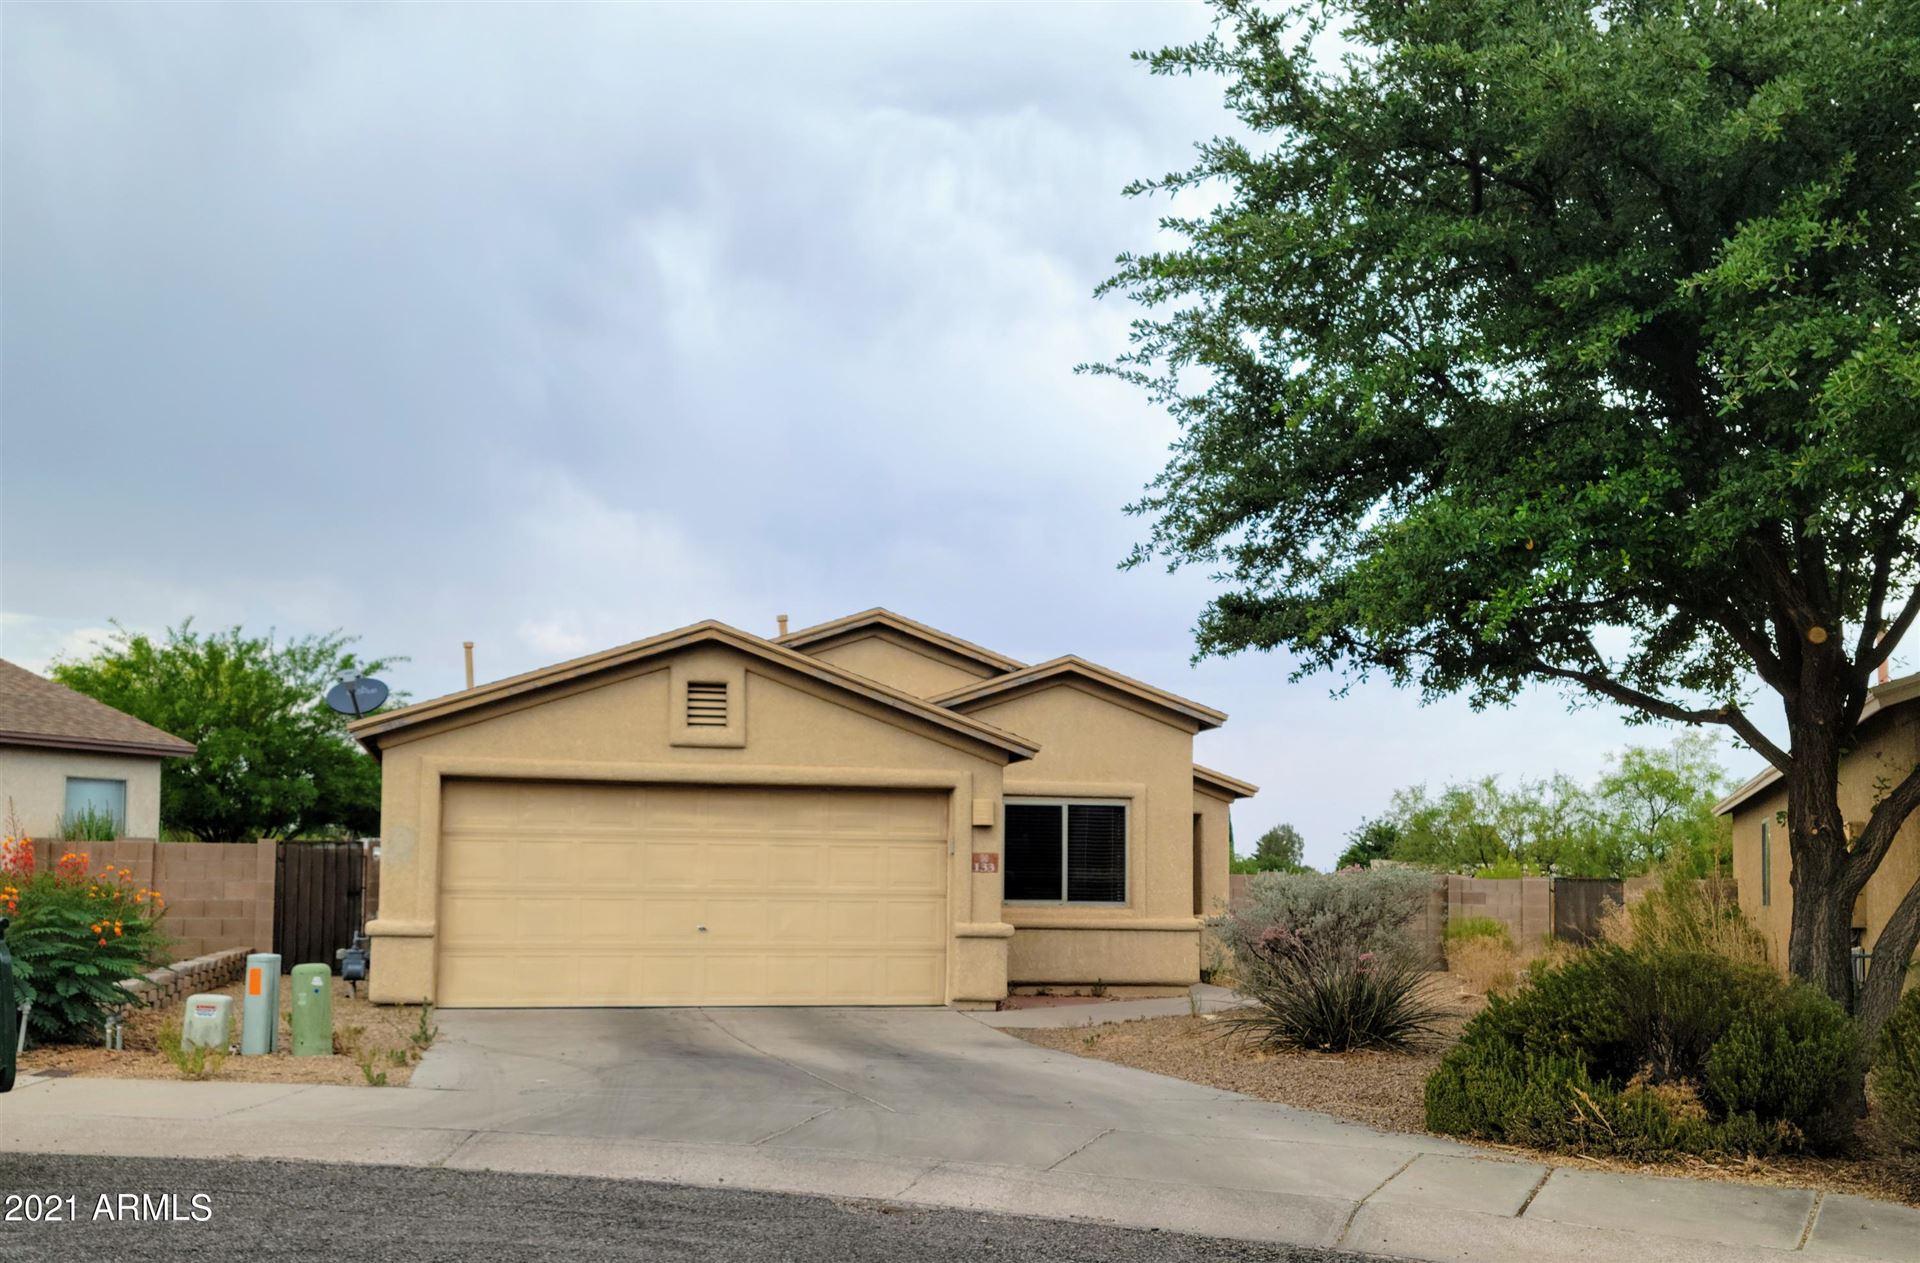 133 N AVELINO Place, Sierra Vista, AZ 85635 - MLS#: 6254916